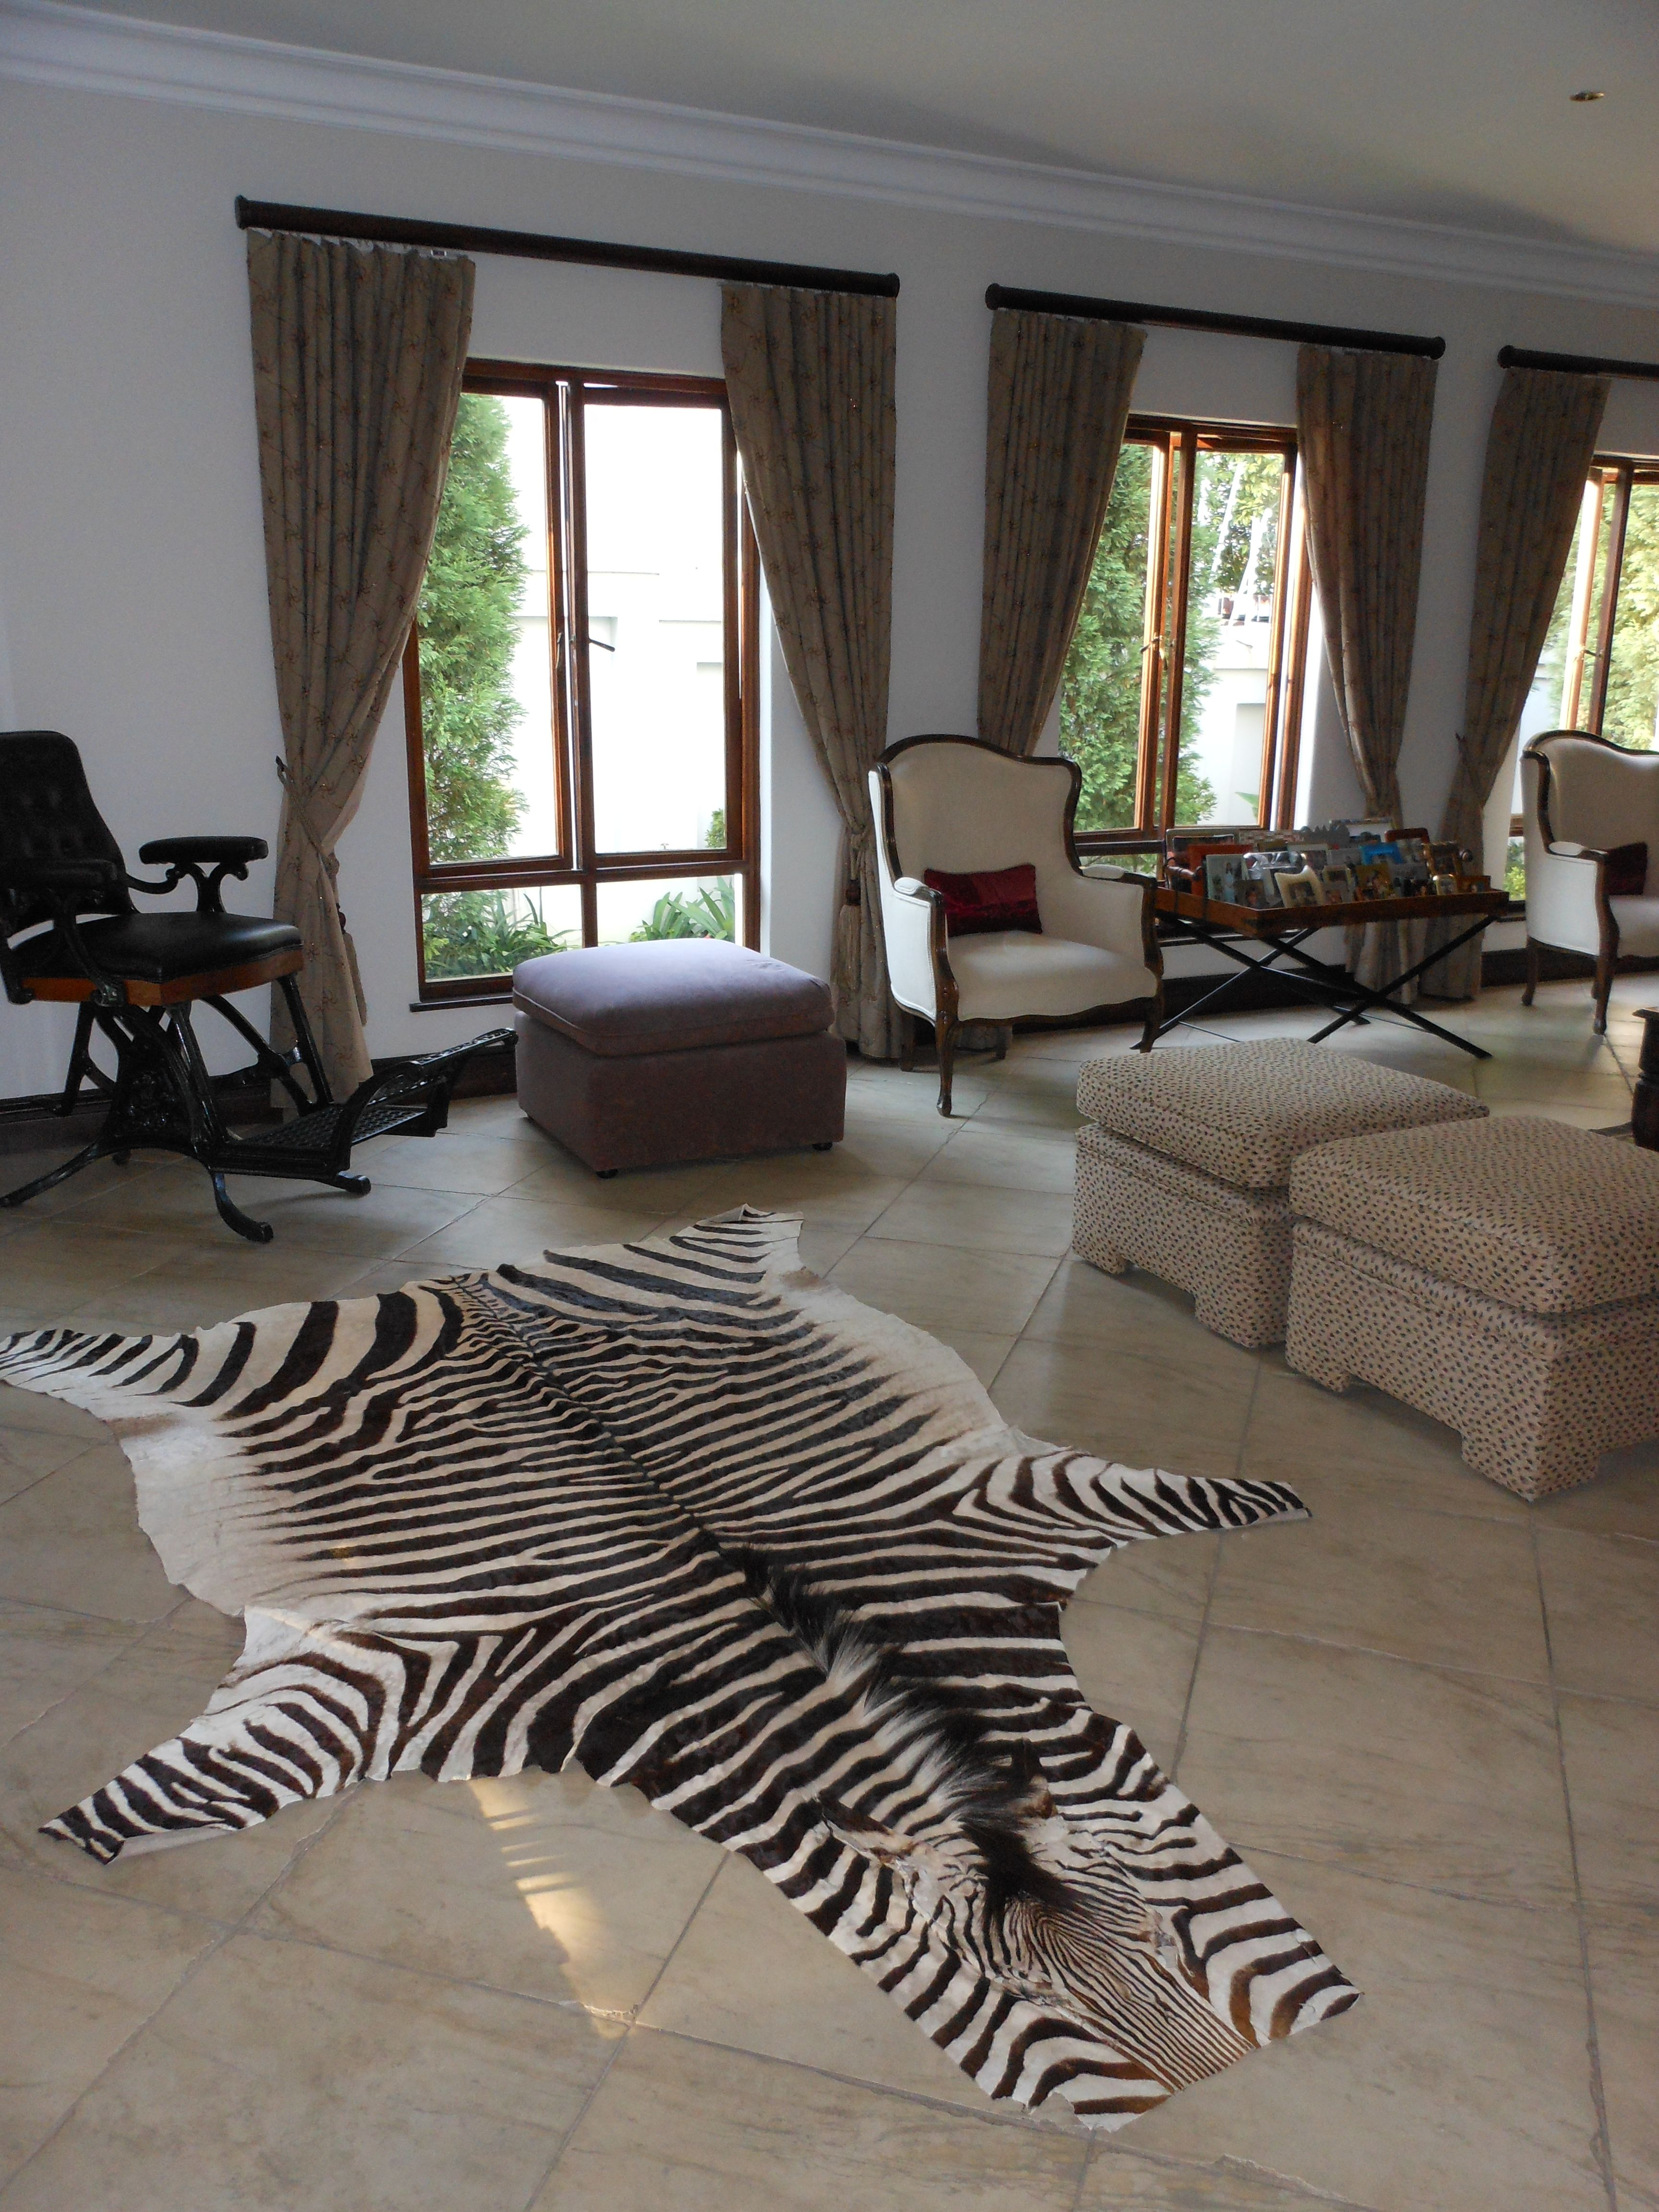 Zebra Skin Decor By Instyle Indulgence Interiors African Home Decor Living Decor South African Decor #zebra #living #room #decor